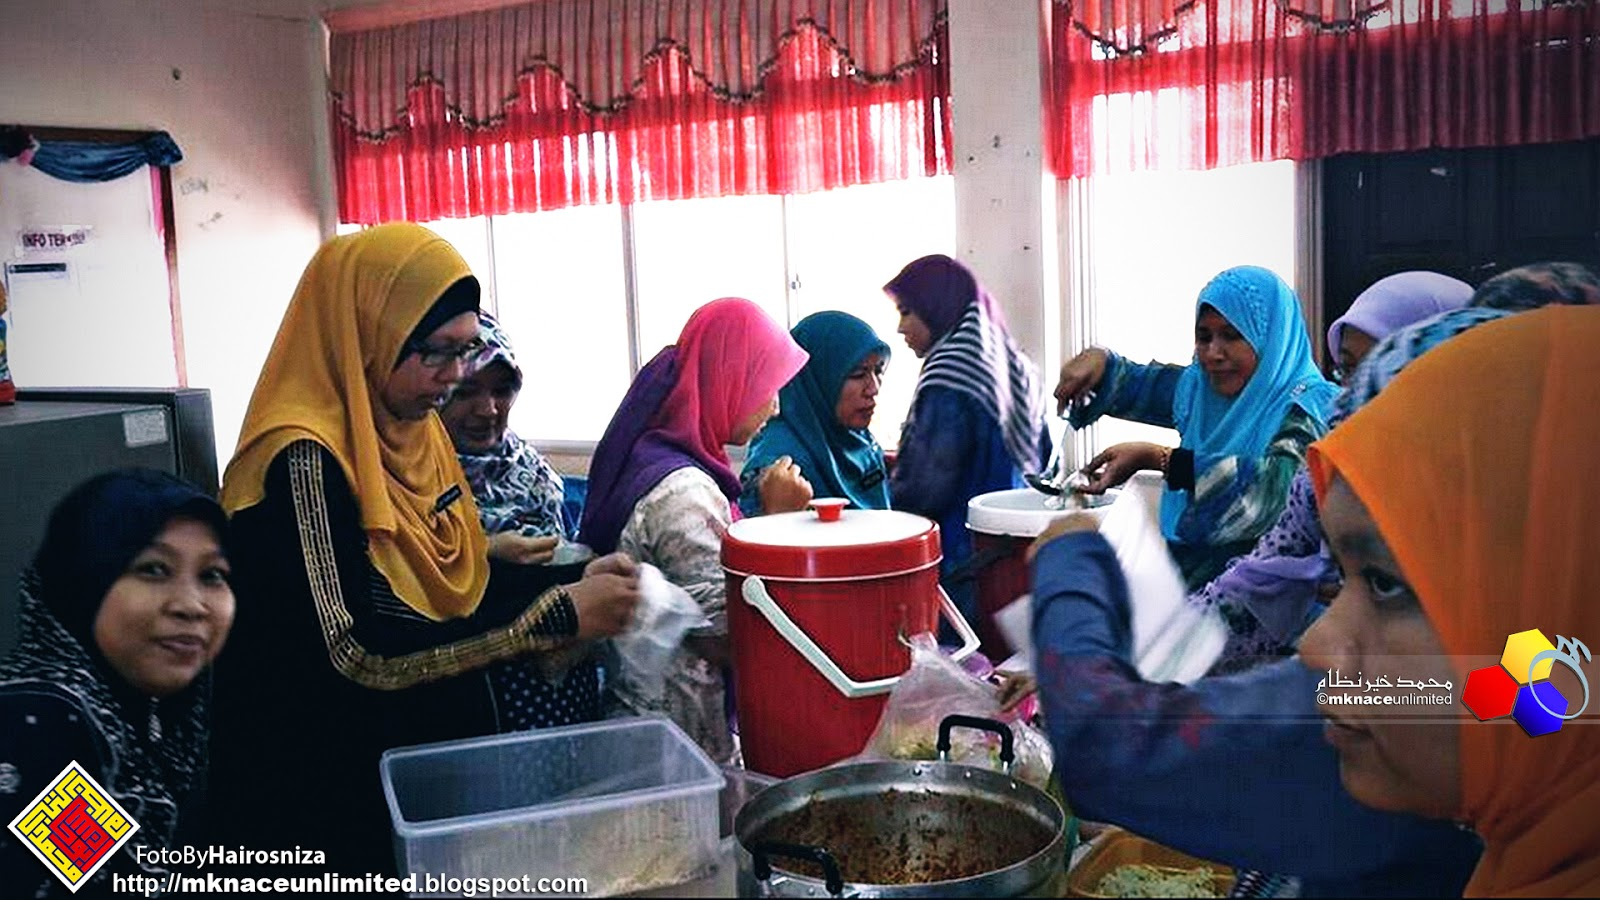 Potluck Post Aidilfitri Kebirus Smk Taman Nusajaya 2015 Mknace Tcash Vaganza 35 Dialogue Baby Giftset Polka Series 05 Majlis Dibuat Pada 27 Ogos Yang Lepas Bertempat Di Bilik Guru Layannzzz